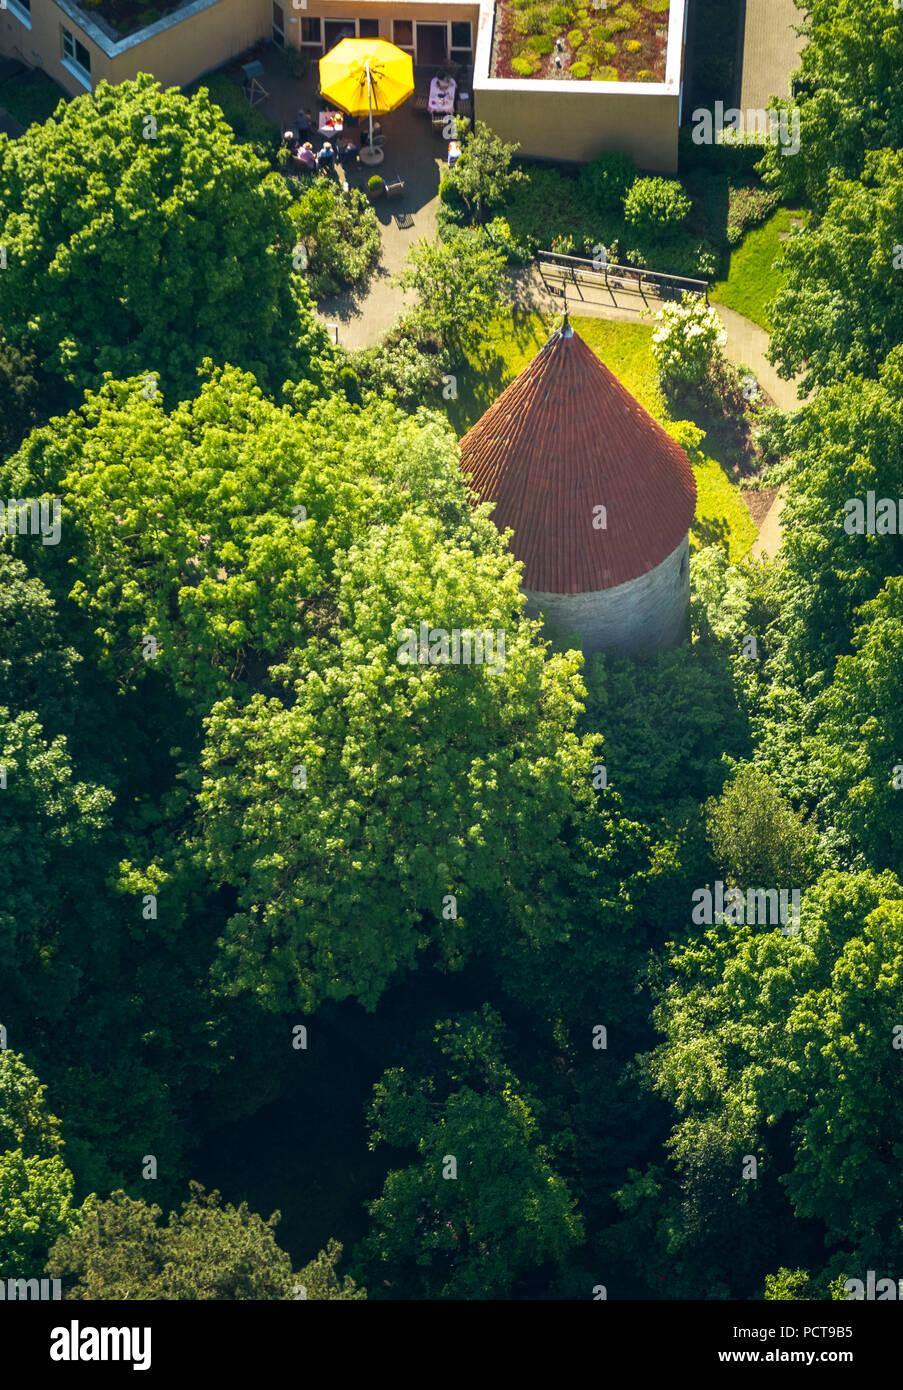 Bentheim Tower, Warendorf, disrict ville de Warendorf, Rhénanie du Nord-Westphalie, Allemagne Banque D'Images